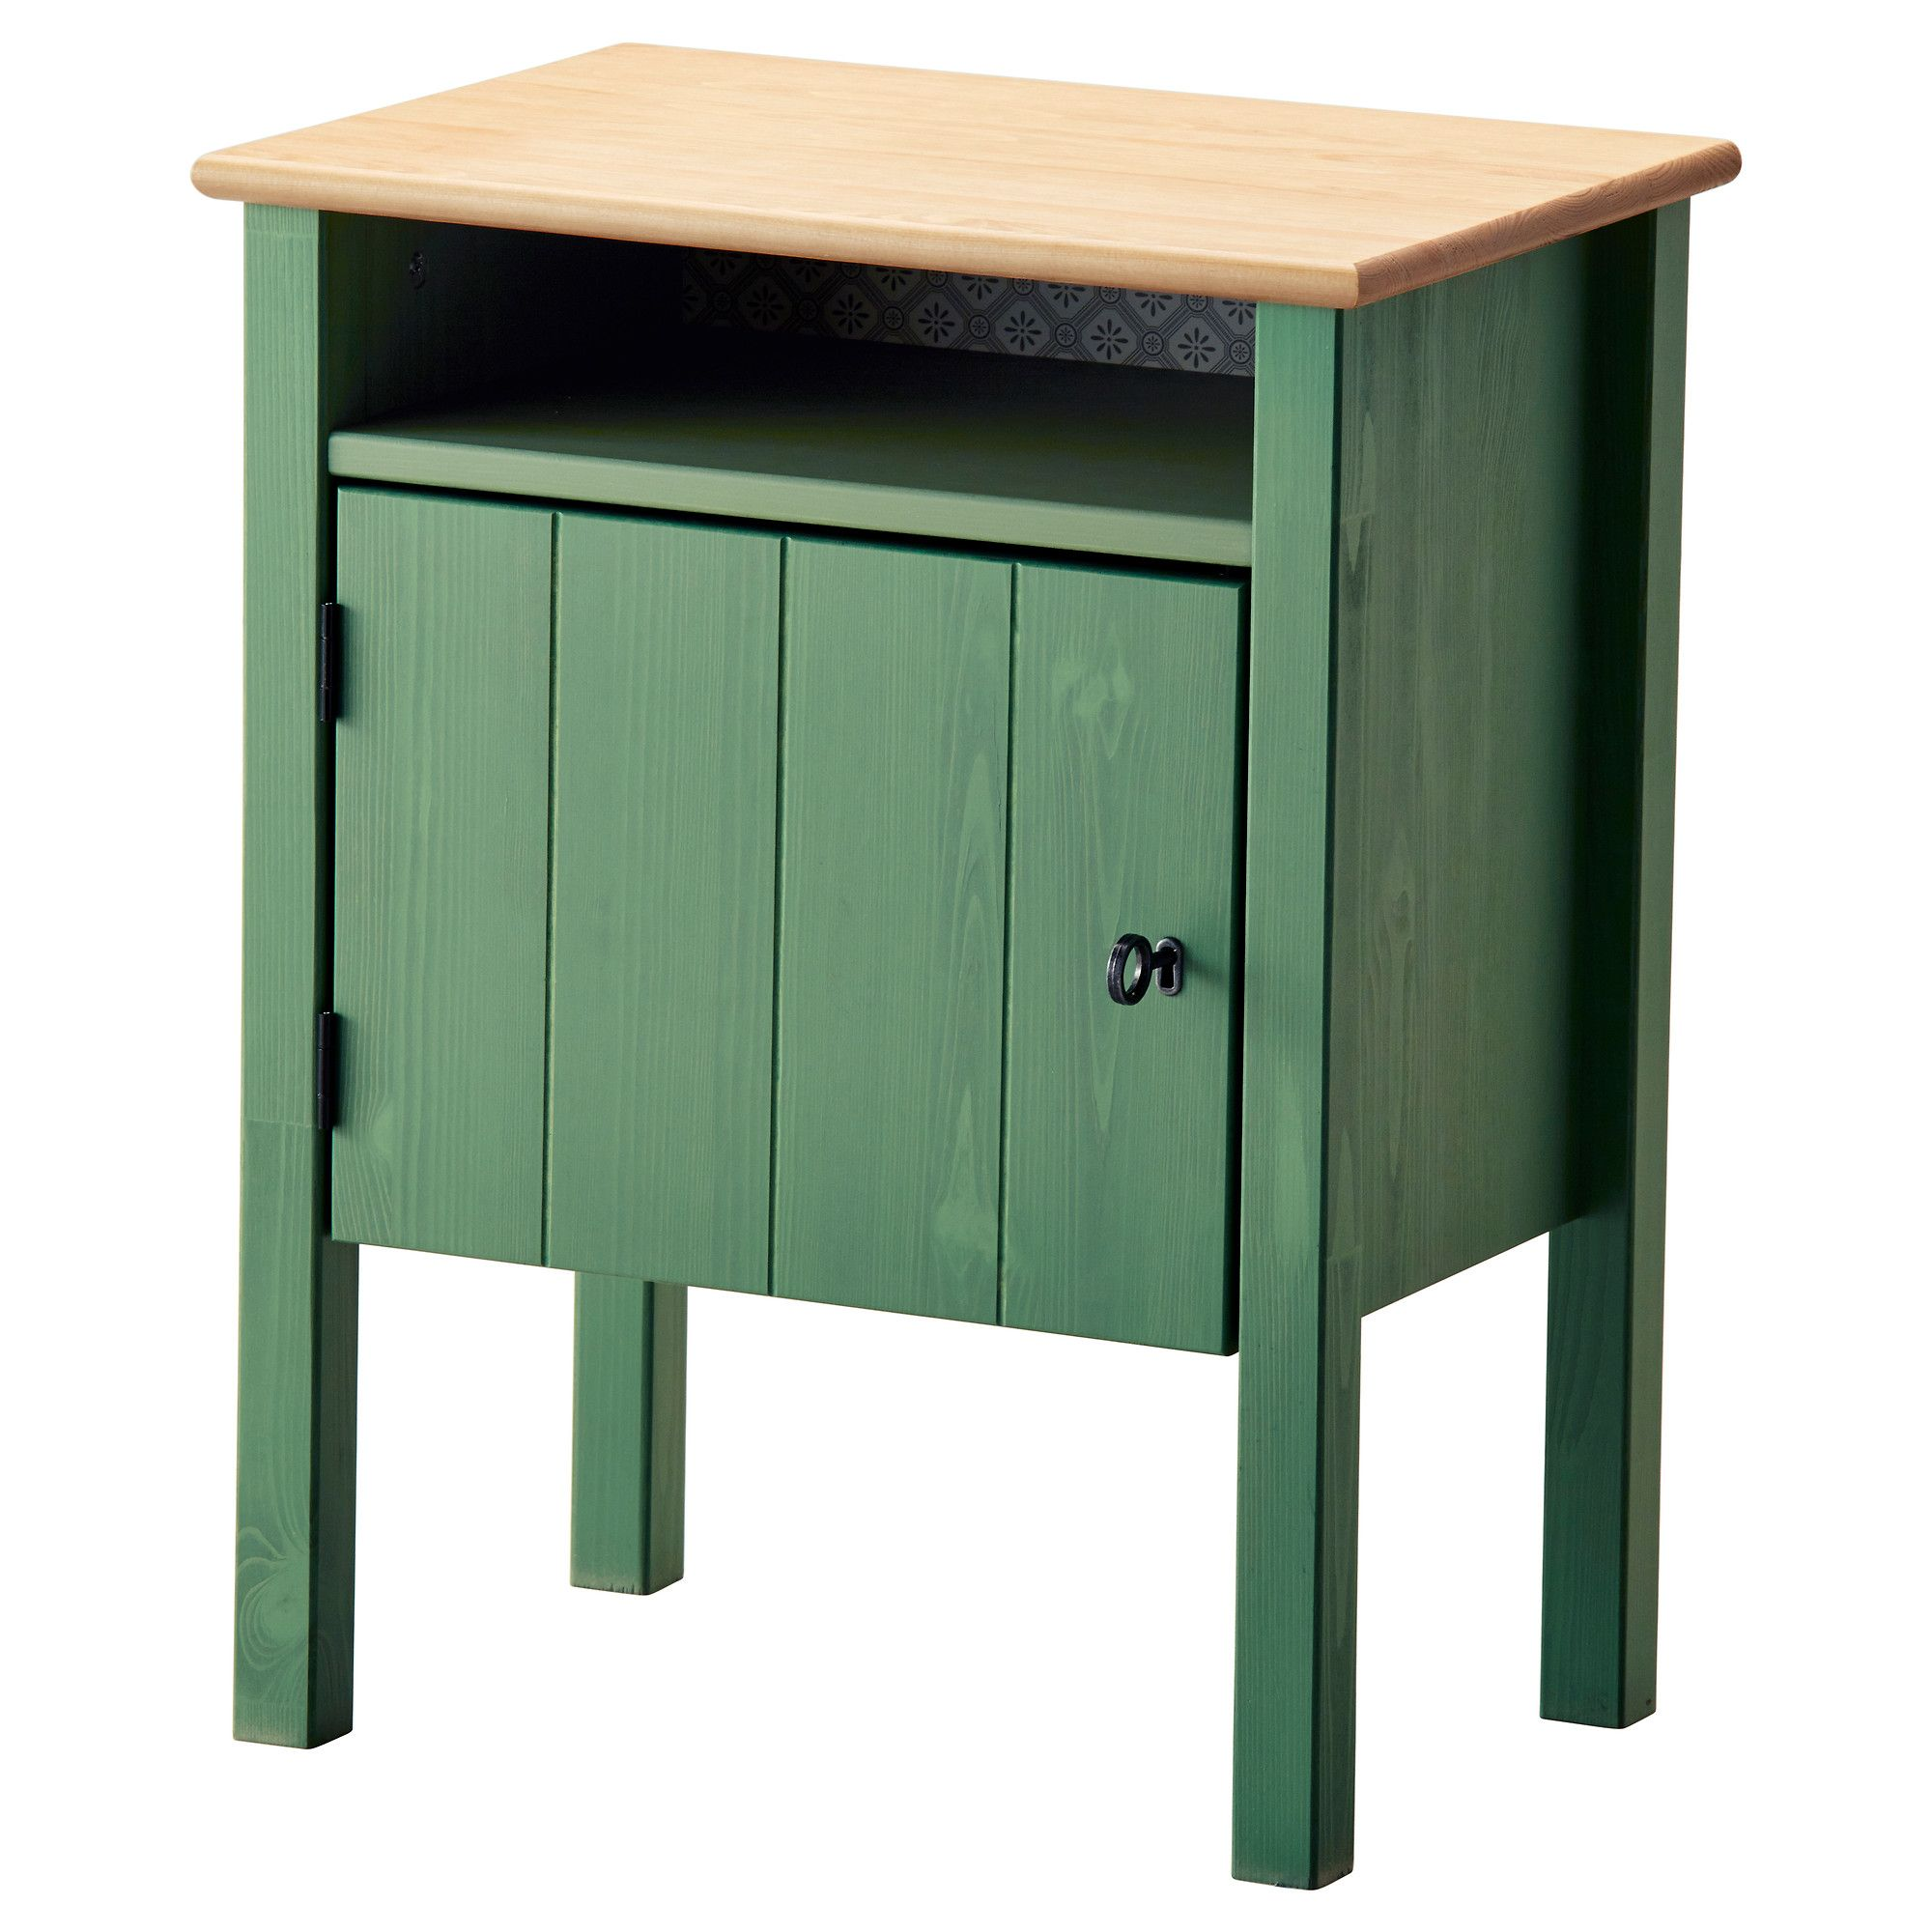 Ikea comodini cheap klabb lampada da tavolo ikea lampade for Comodini shabby ikea